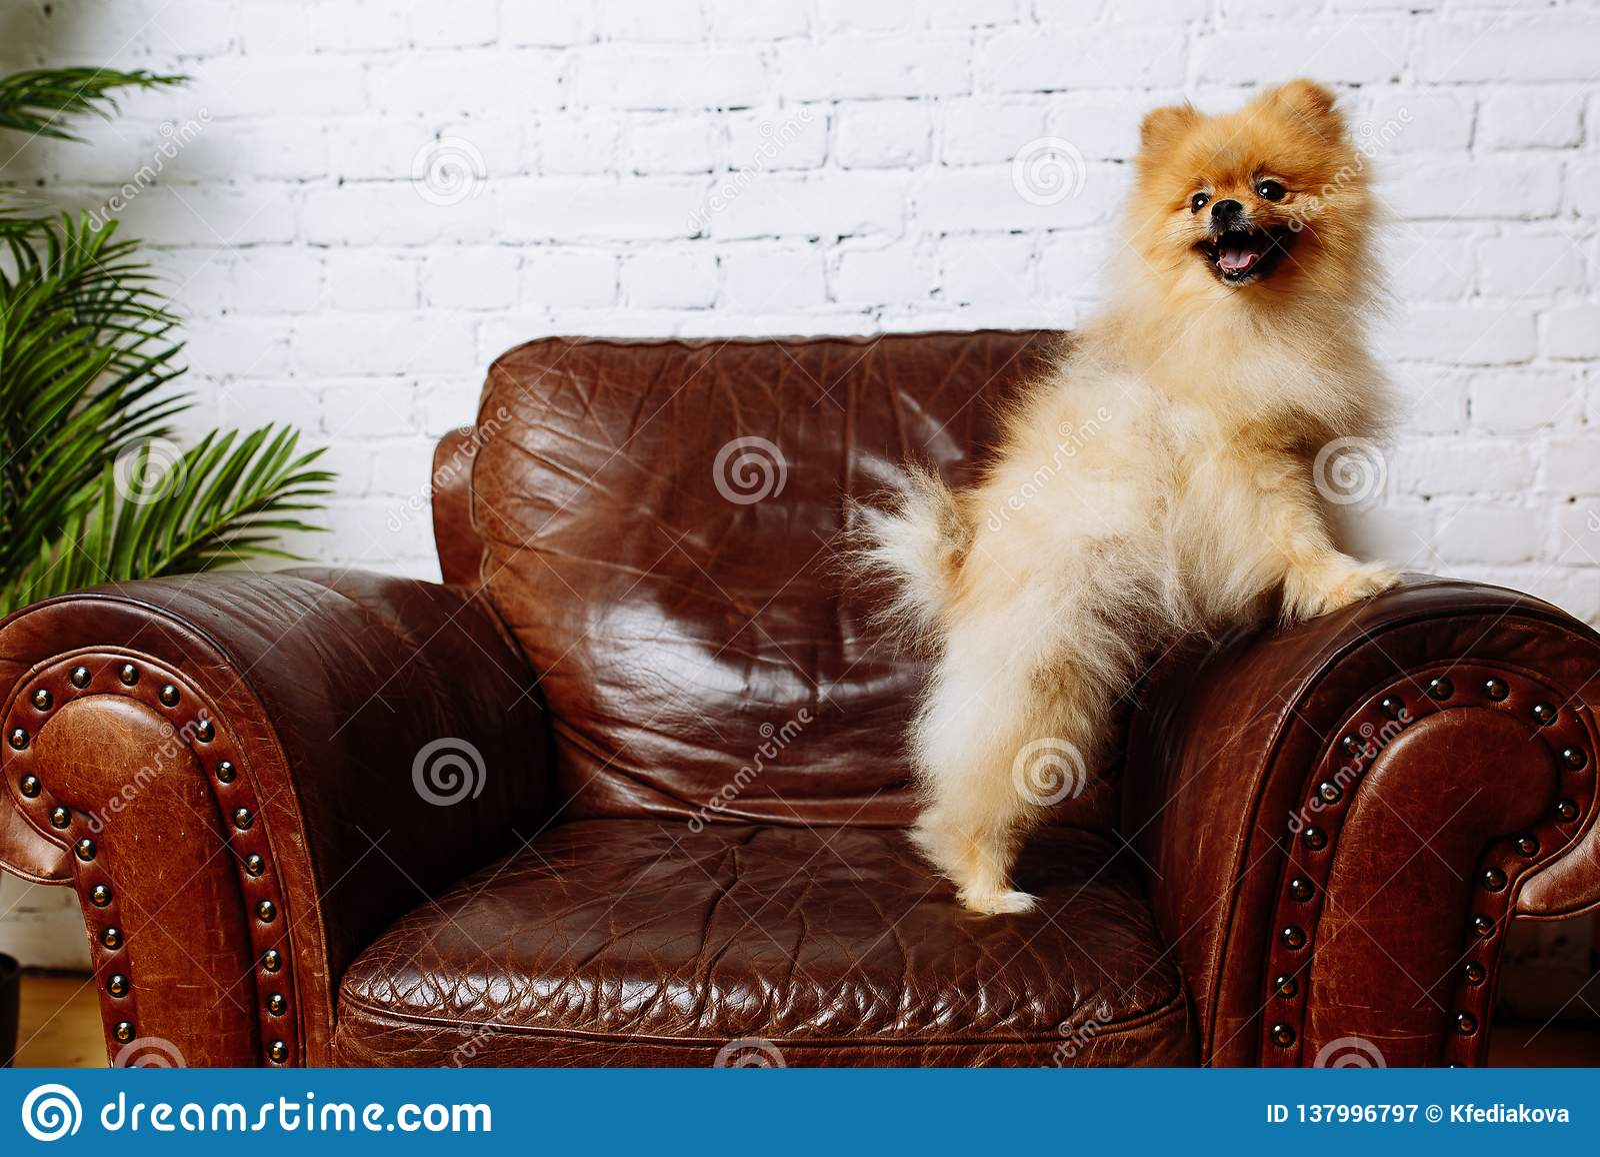 Cute Spitz dog sitting in armchair